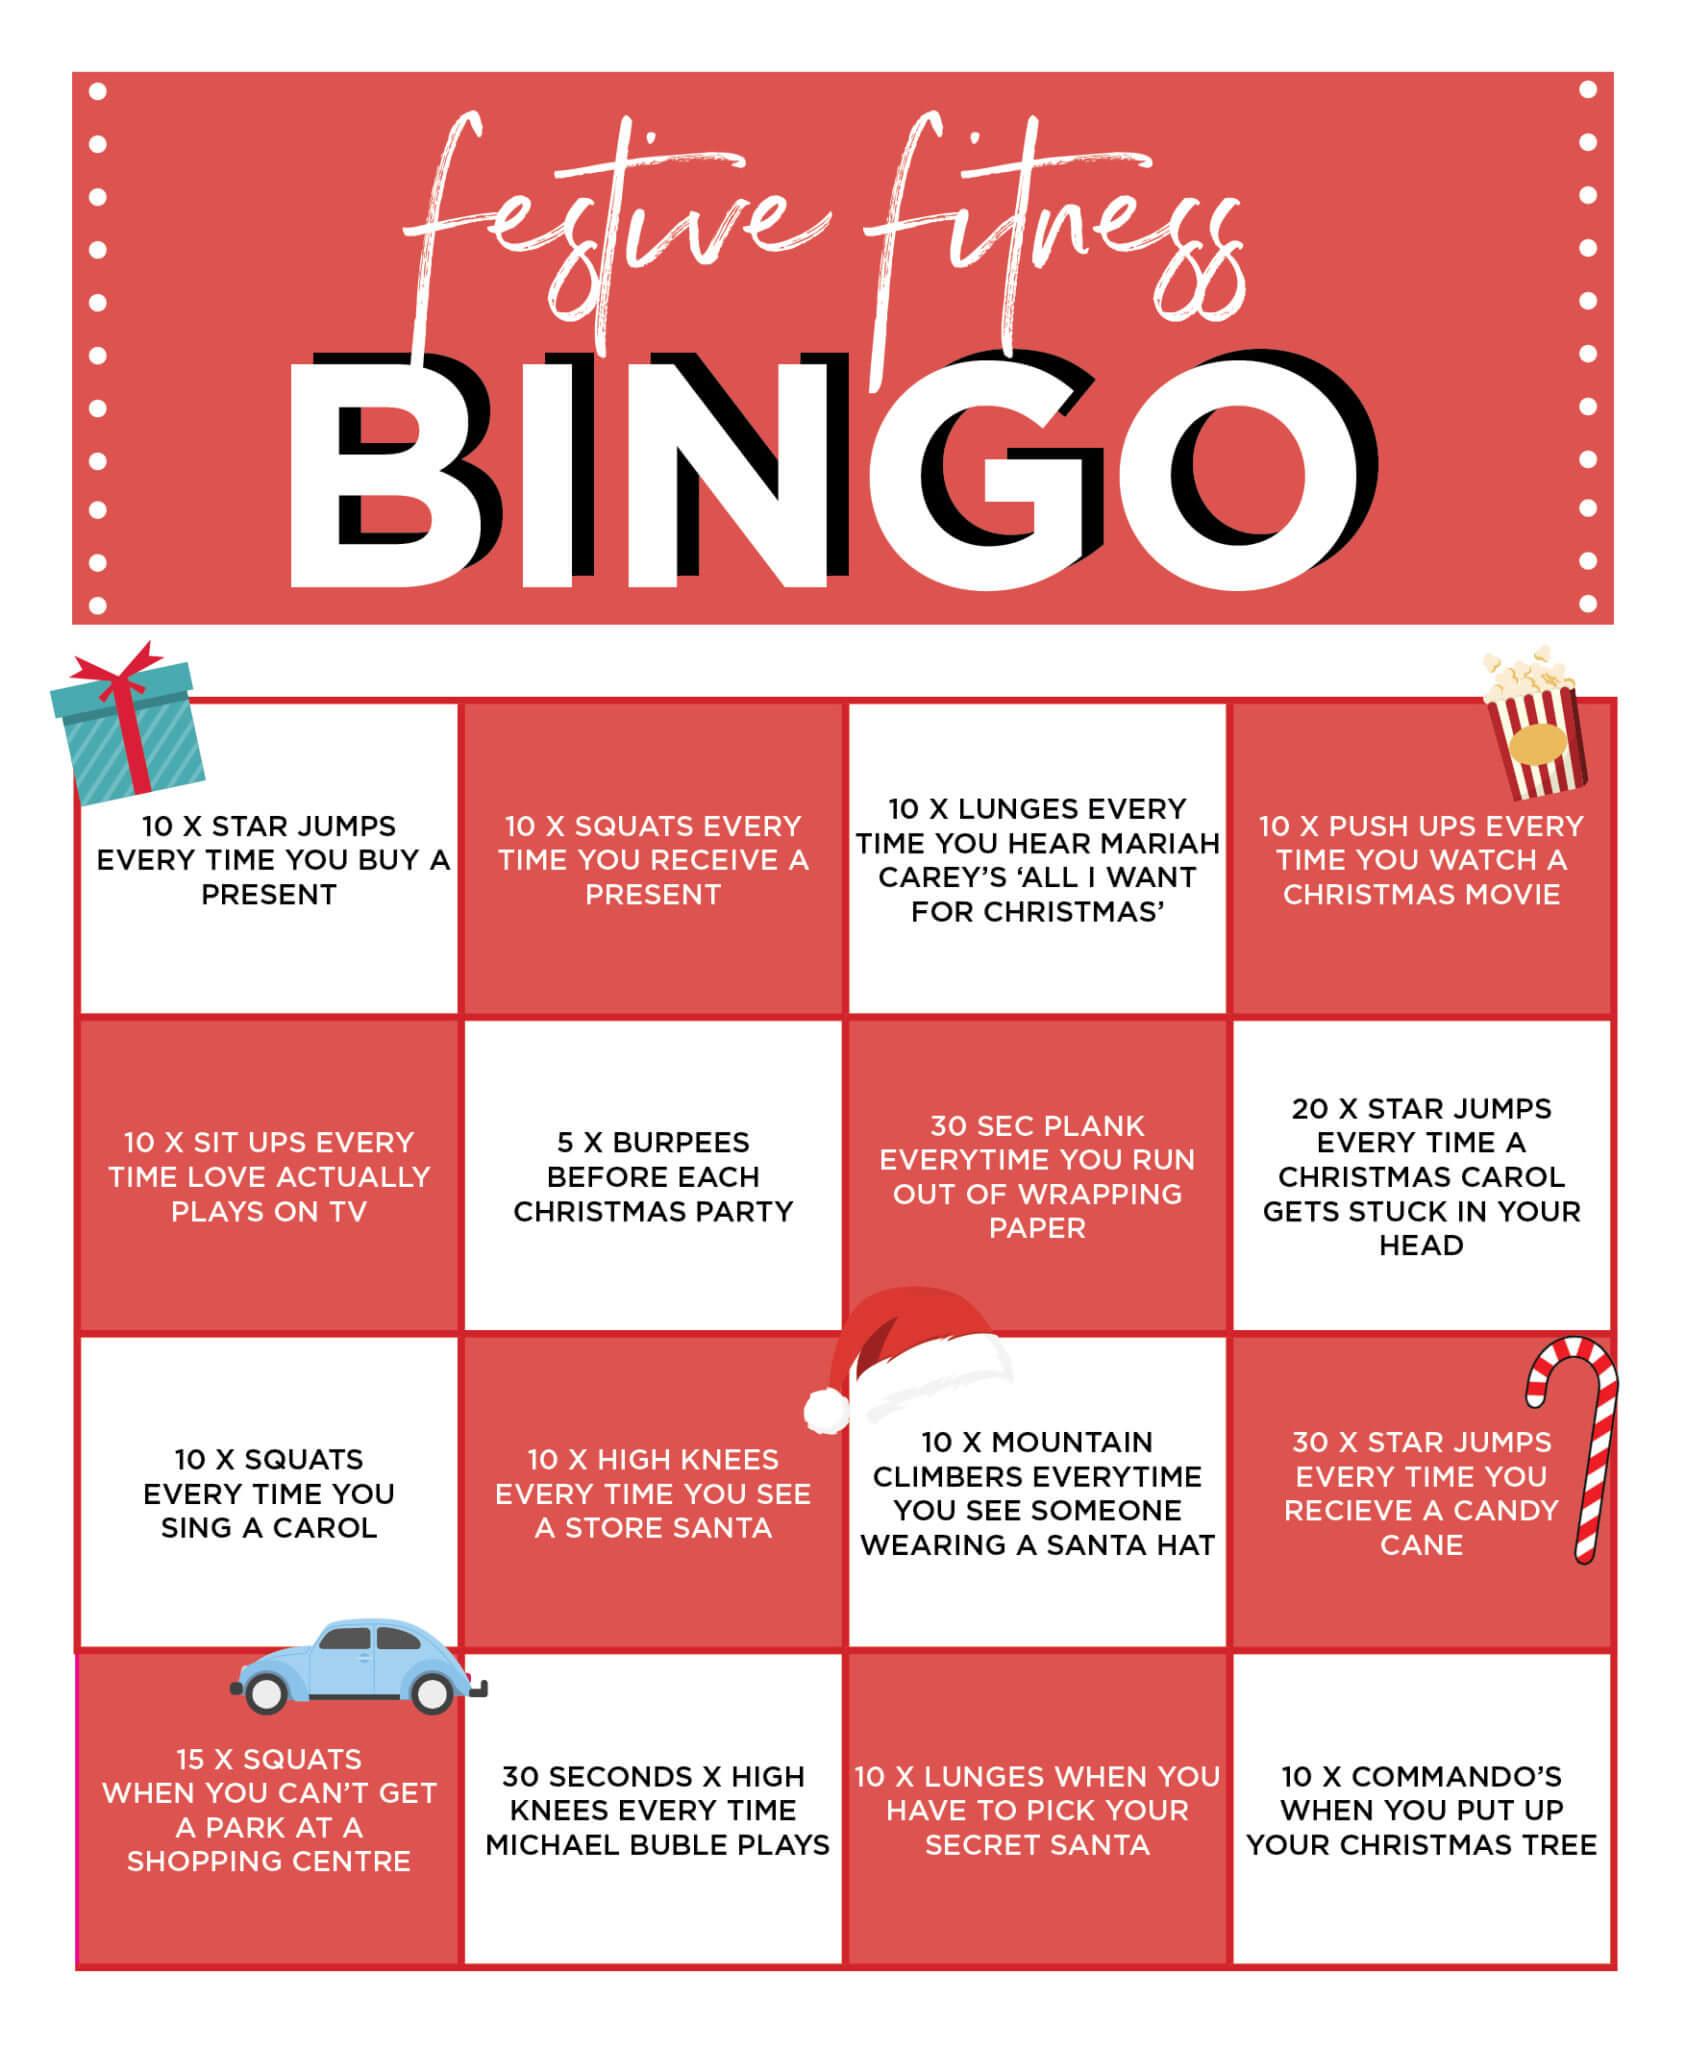 Festive Fitness Bingo!